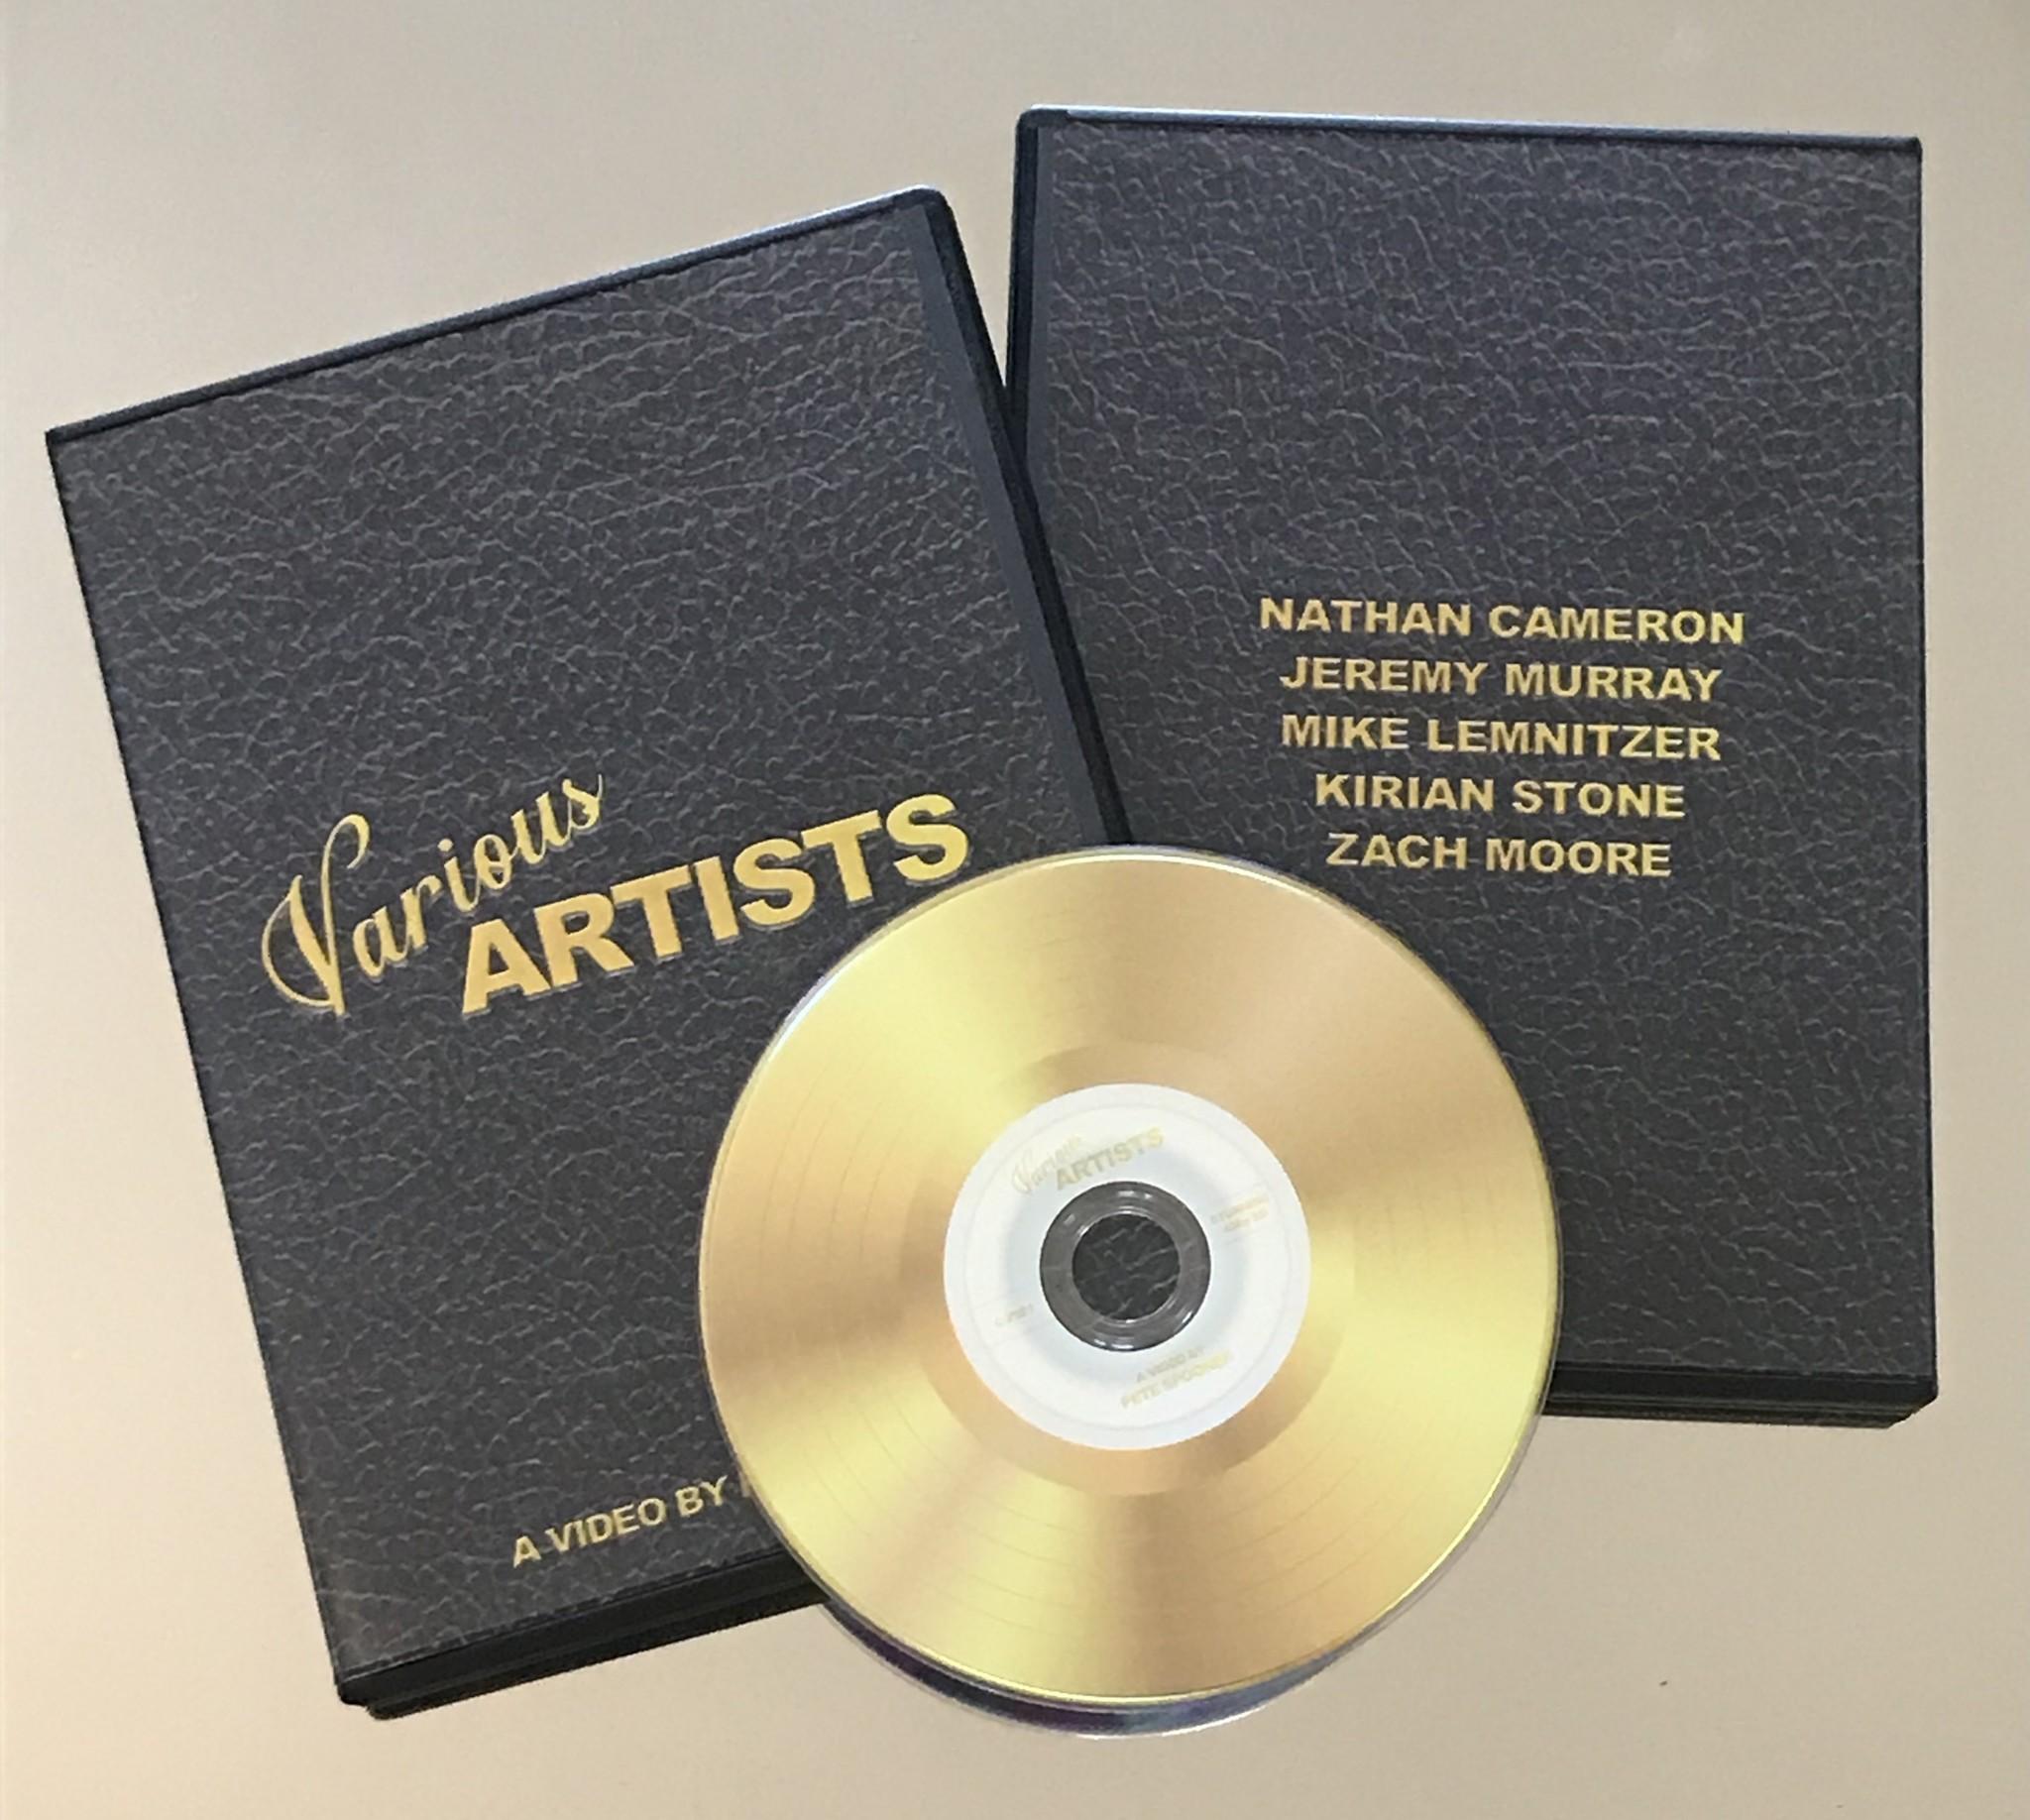 FAMILIA SKATESHOP VARIOUS ARTISTS DVD